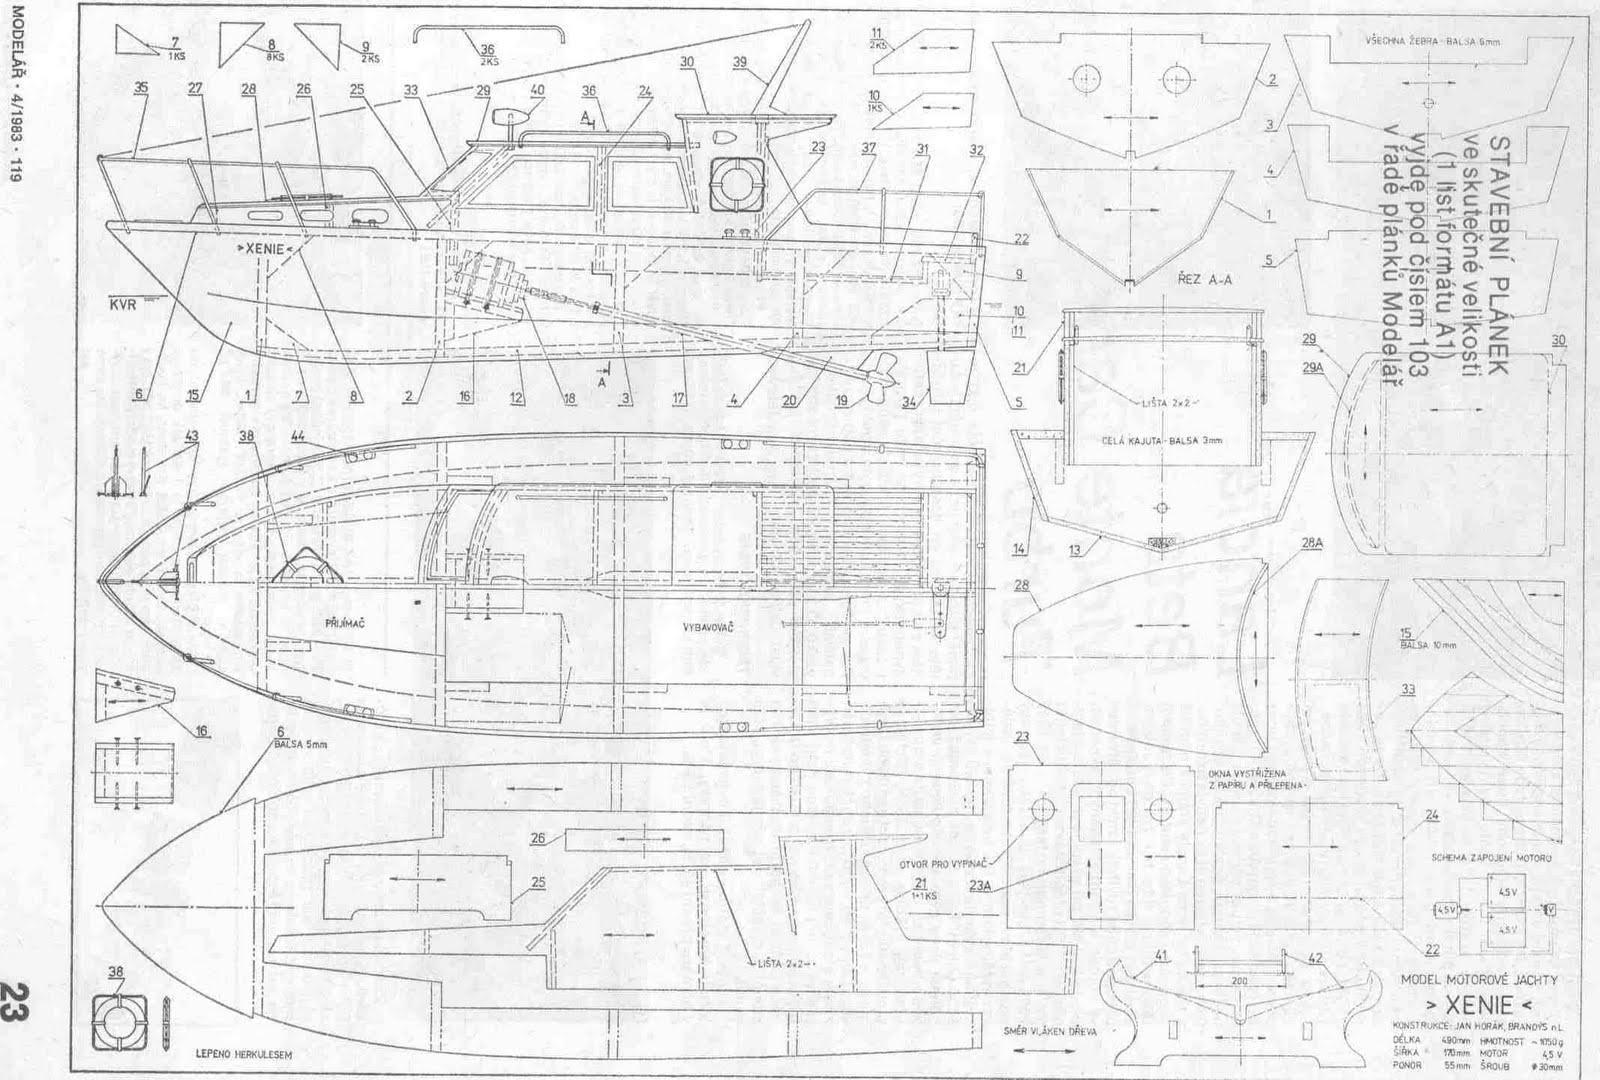 Bateau boat plans | Sepla